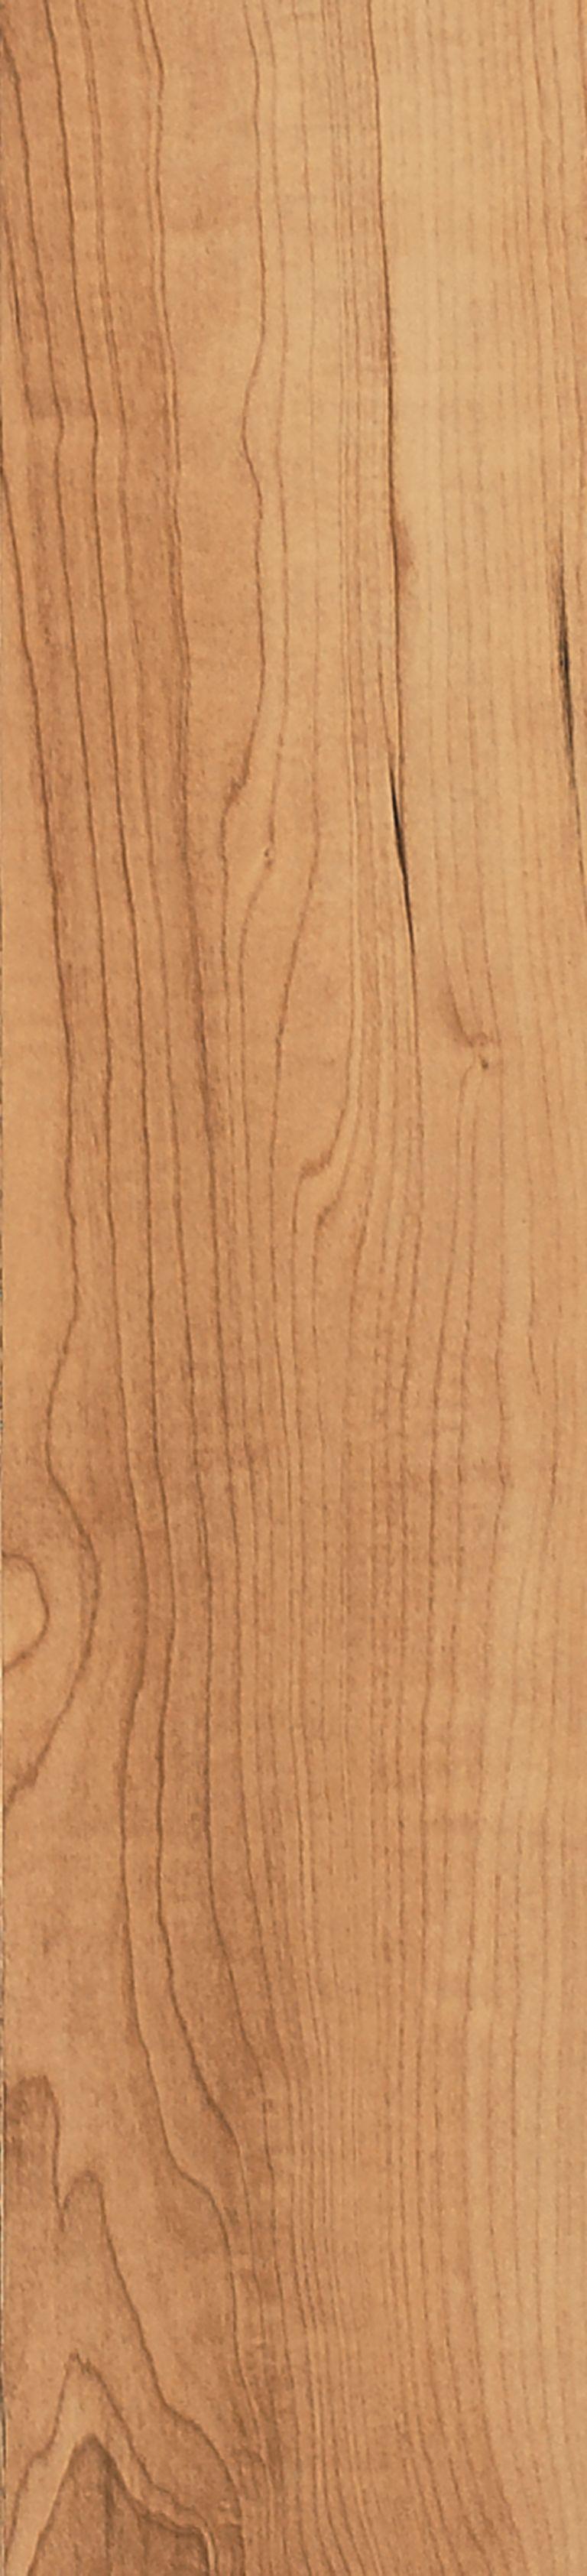 Maple Select Laminado L0202